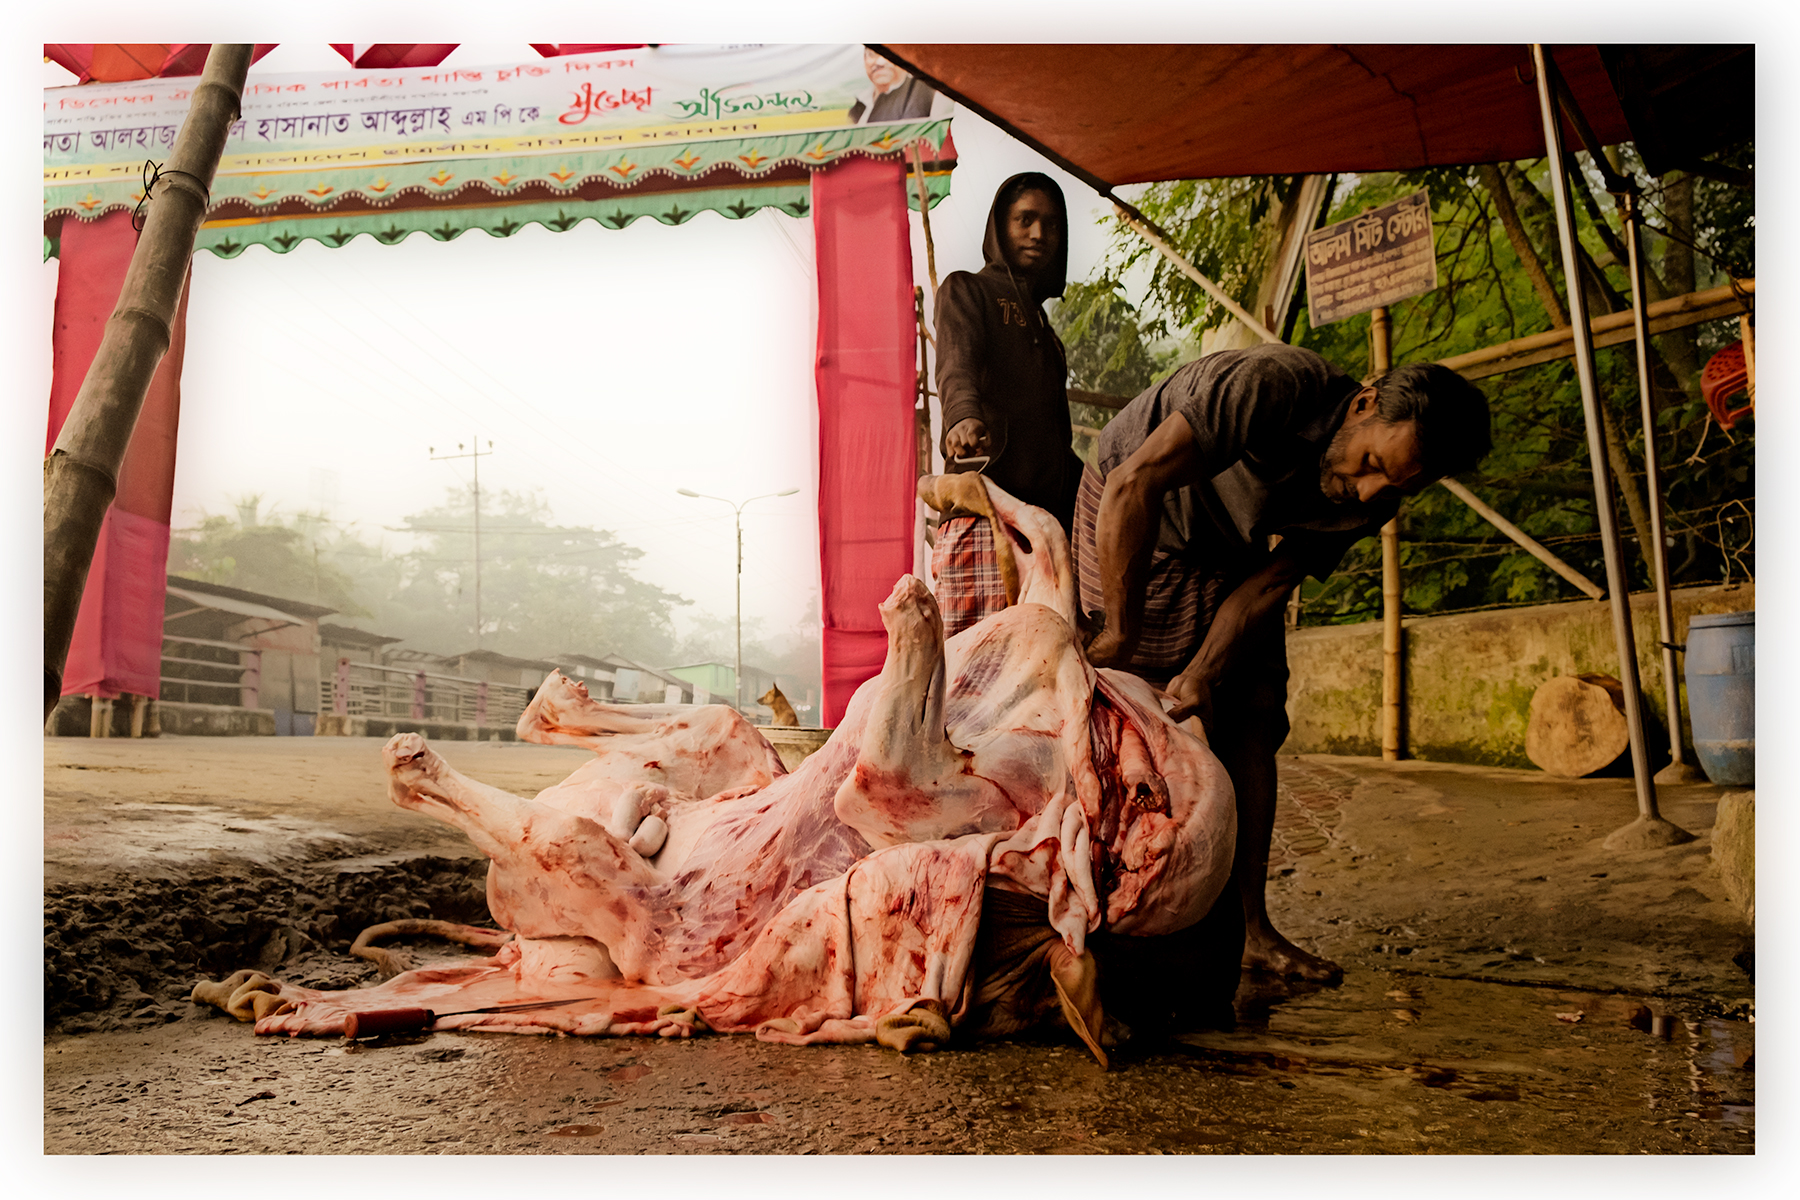 Butchering on the sidewalk, Barisal, Bangladesh